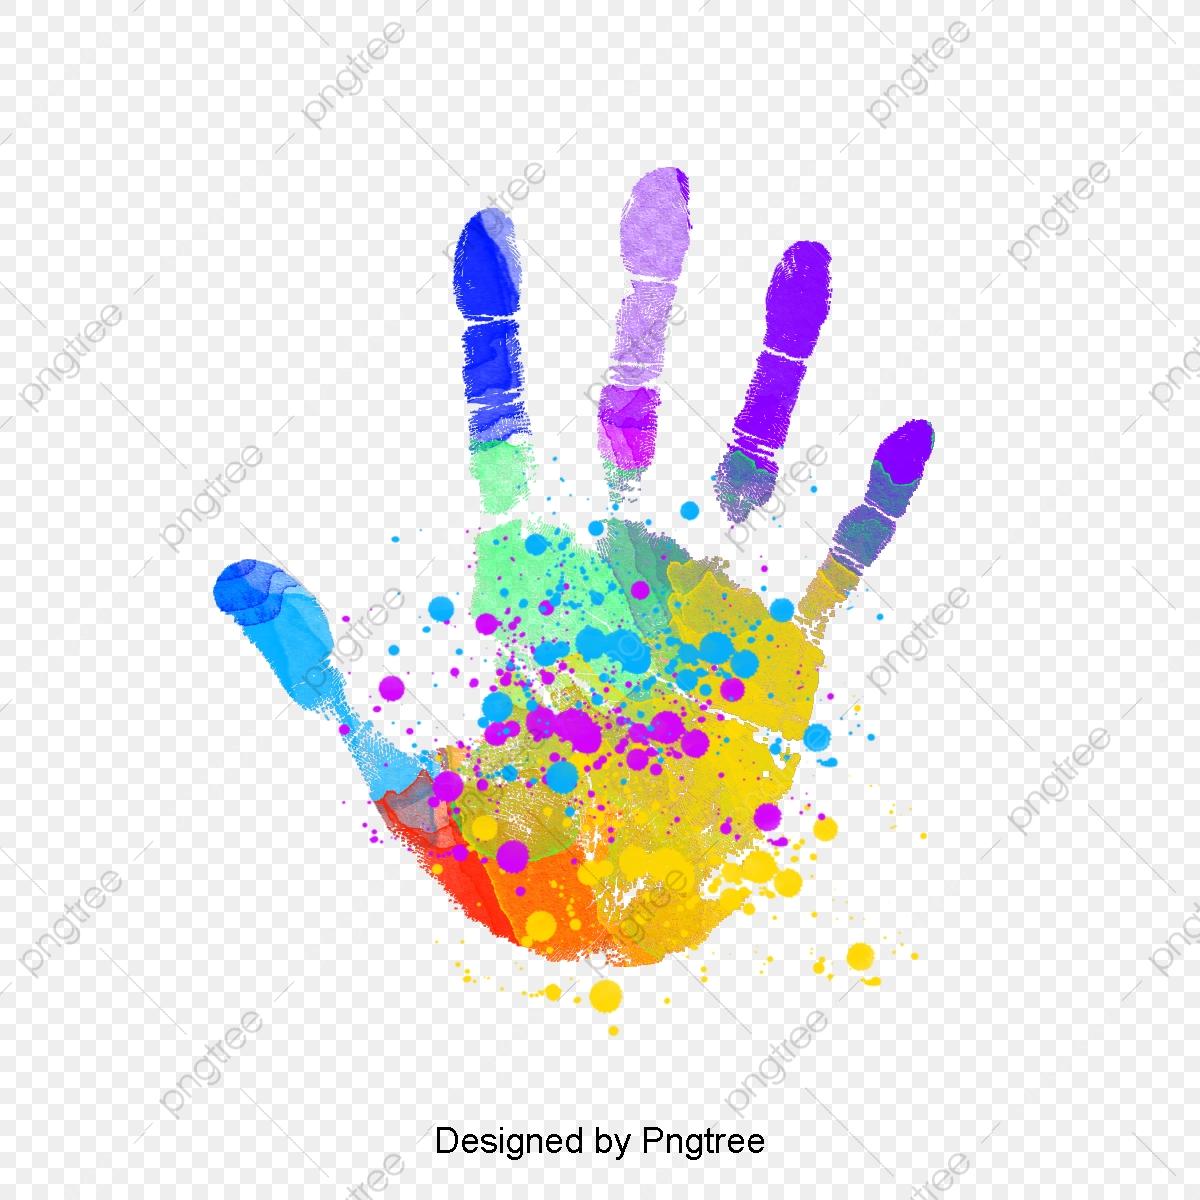 Handprint clipart colored. Graffiti color splash png